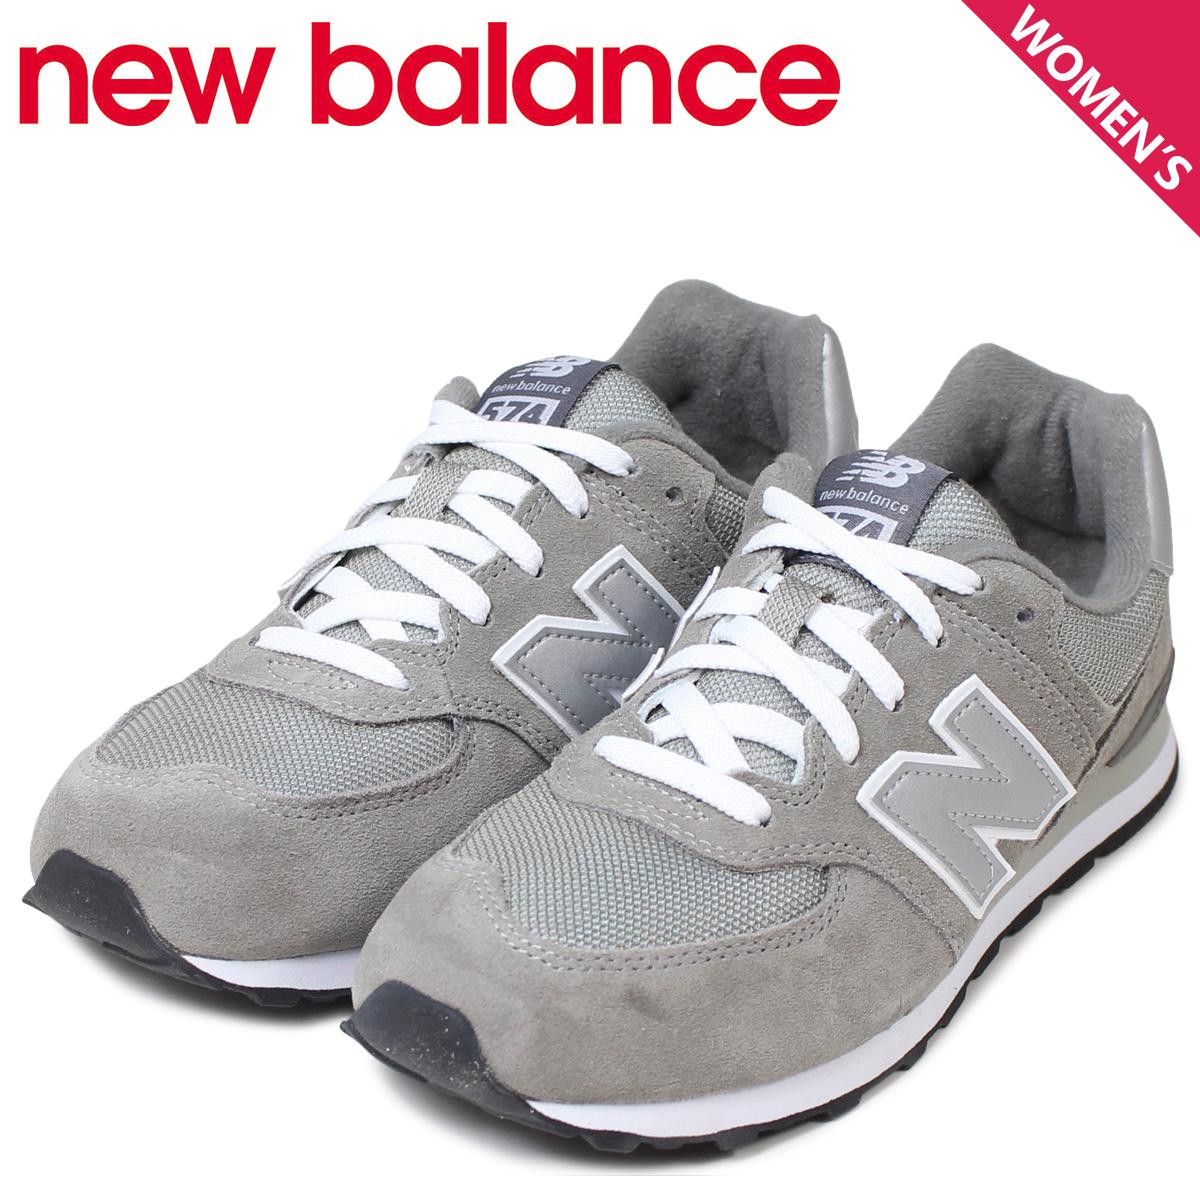 new balance kids 9